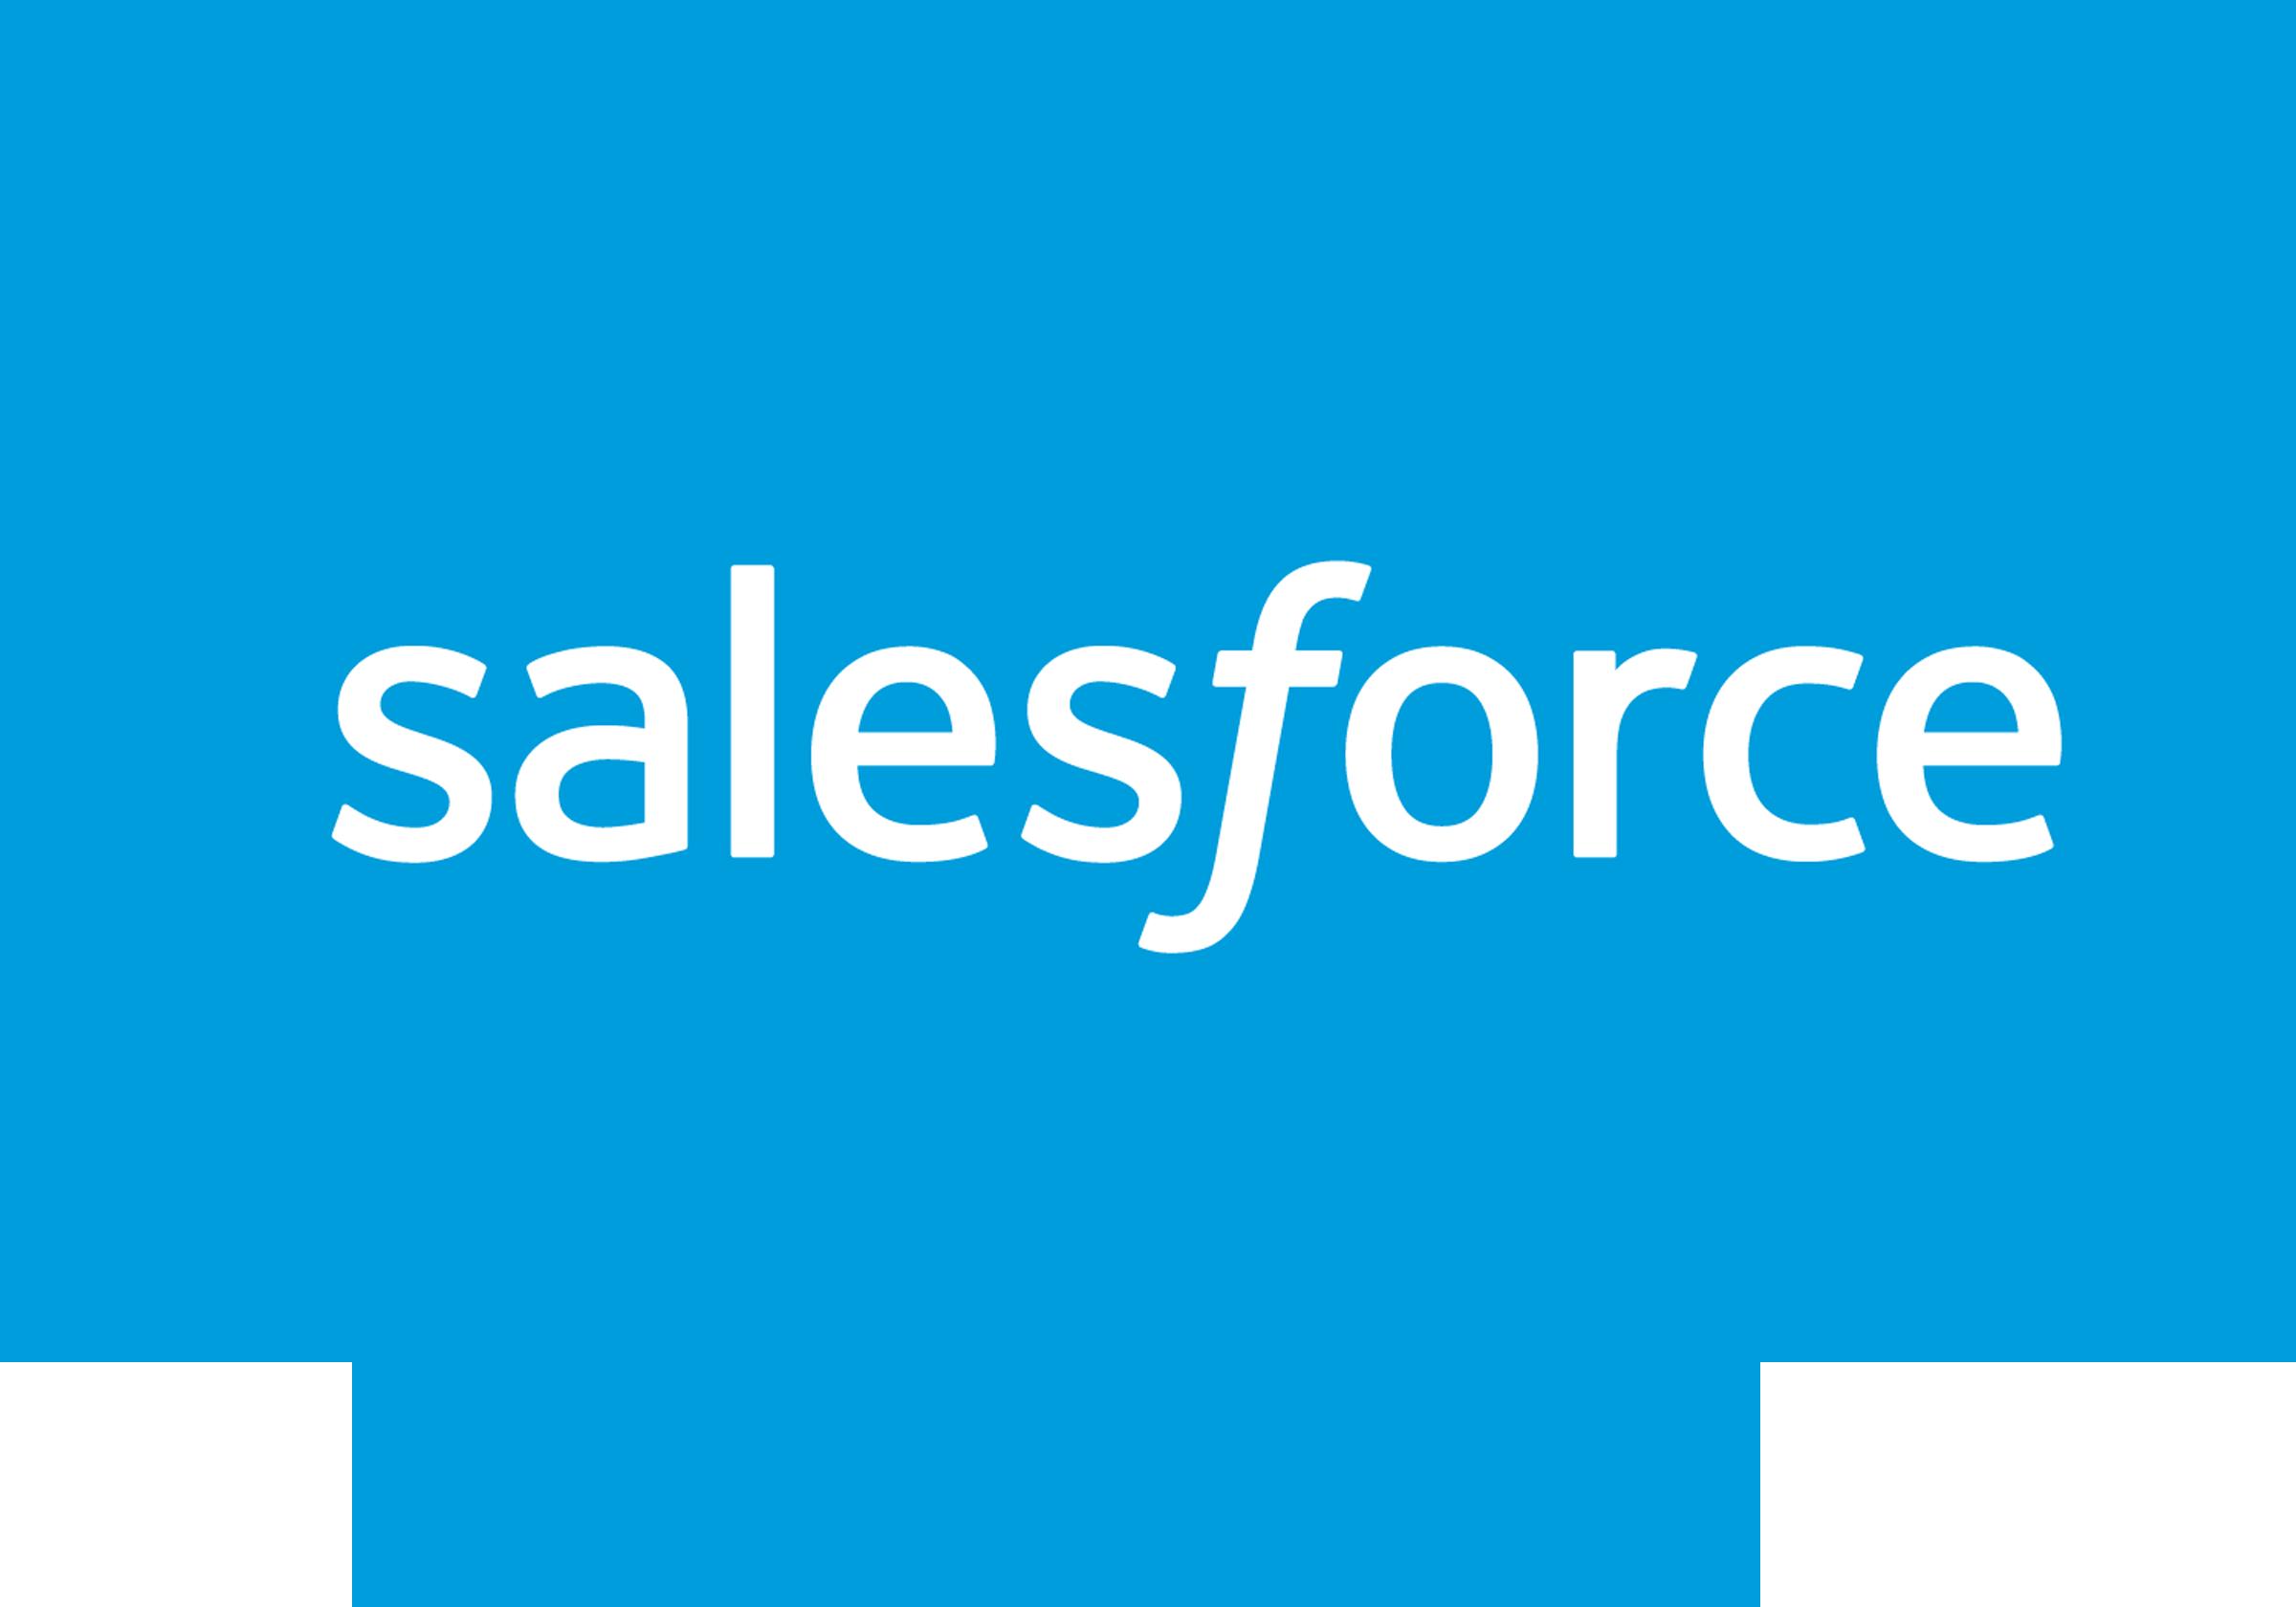 salesforce logo - Ataum berglauf-verband com